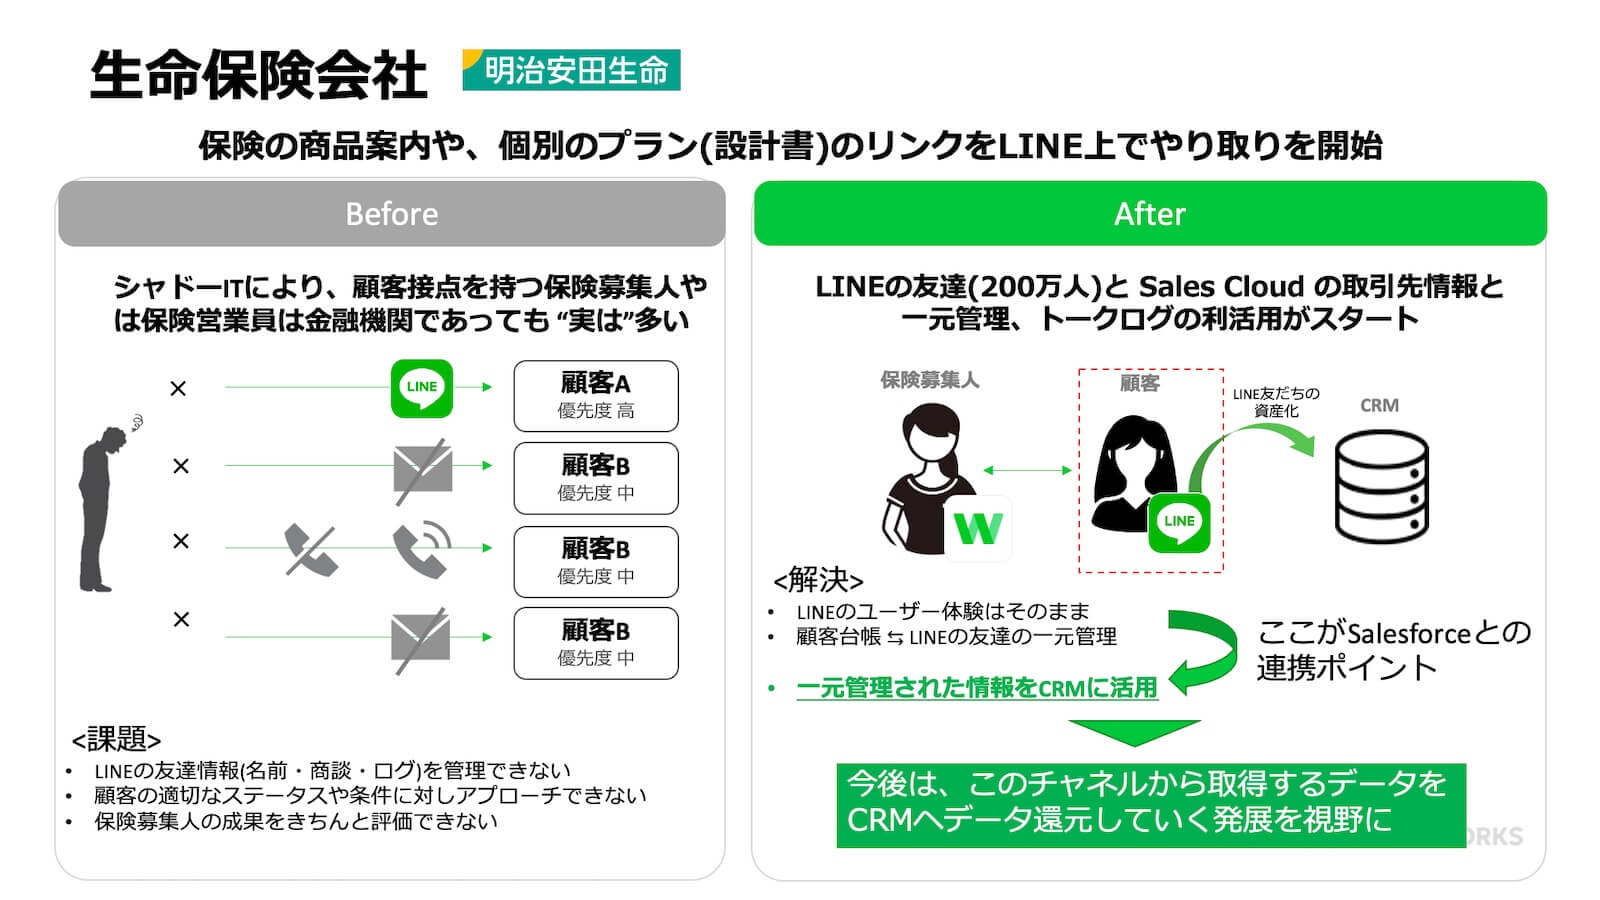 LINE WORKSの活用事例・1(明治安田生命)